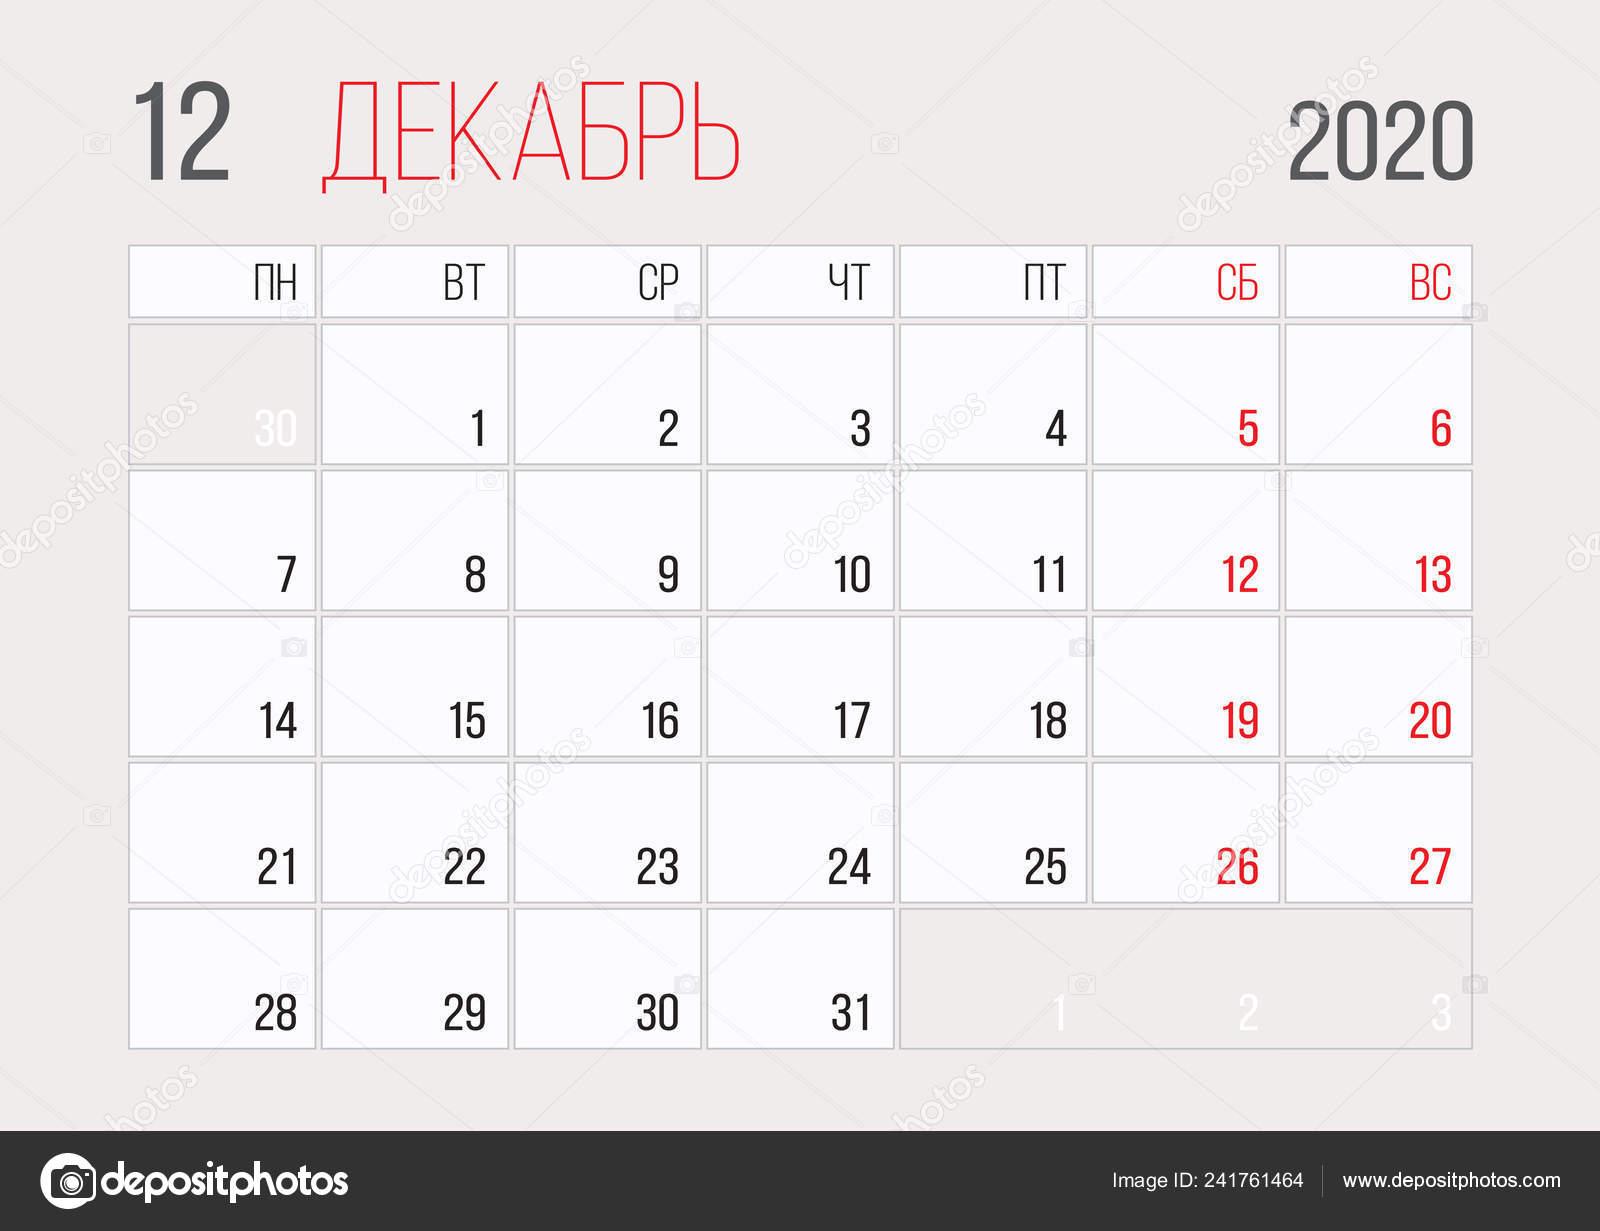 Calendario Diciembre 2020 Para Imprimir.Plantilla Corporativa 2020 Calendario Planificador Ruso Diseno Mes